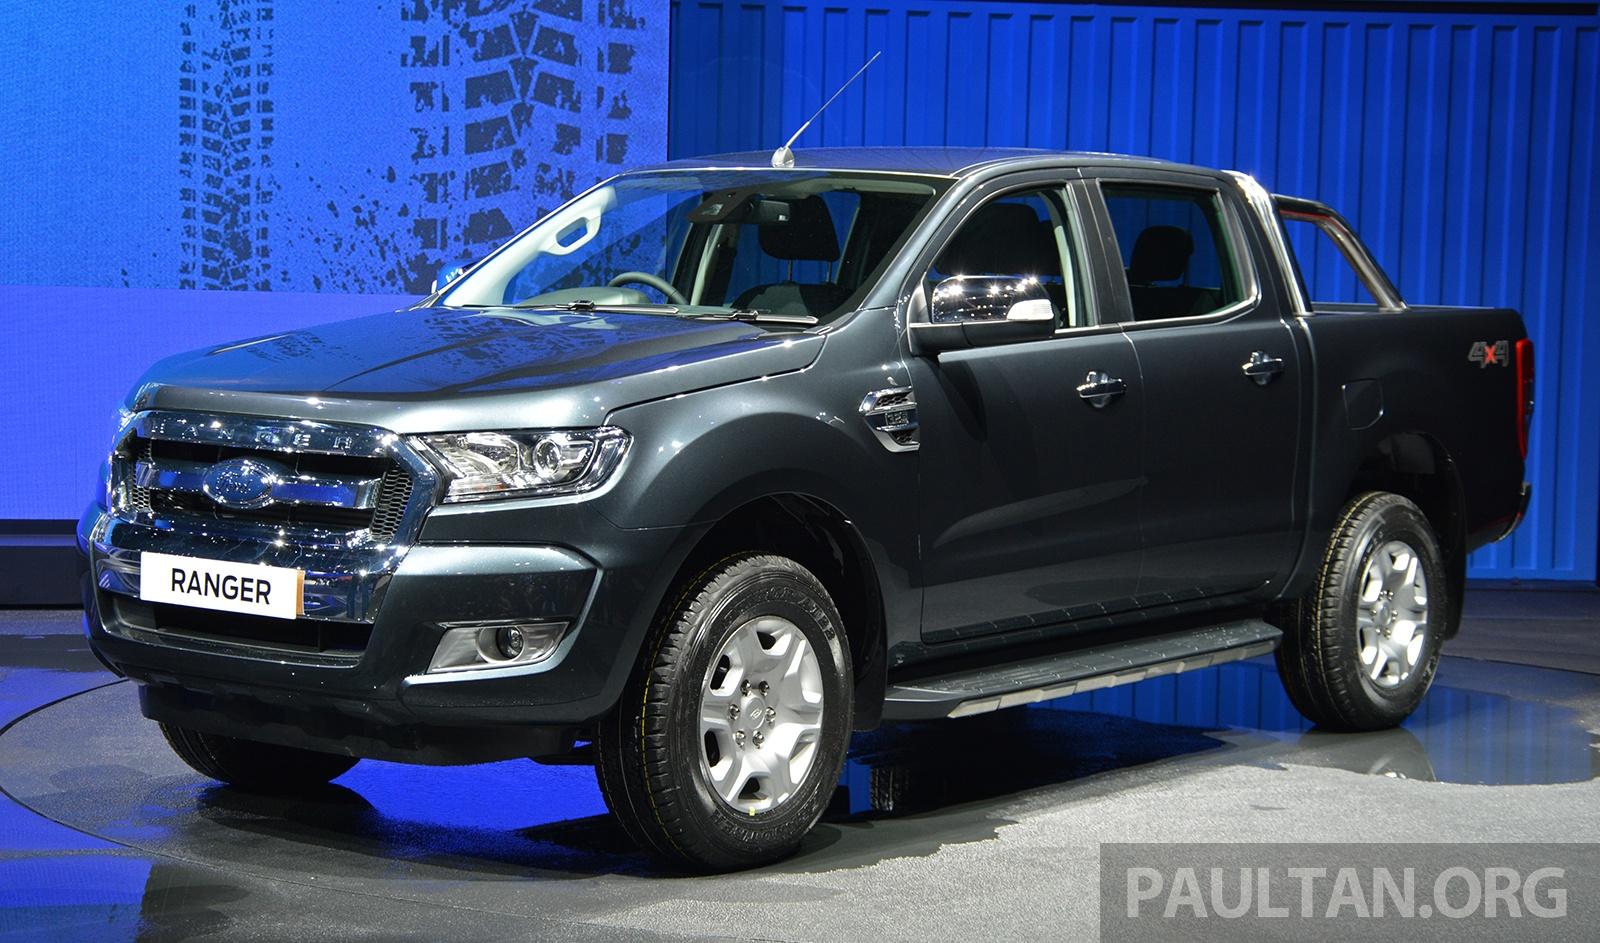 Ranger Ford 2018 >> 2015 Ford Ranger makes world debut in Thailand Image 320438